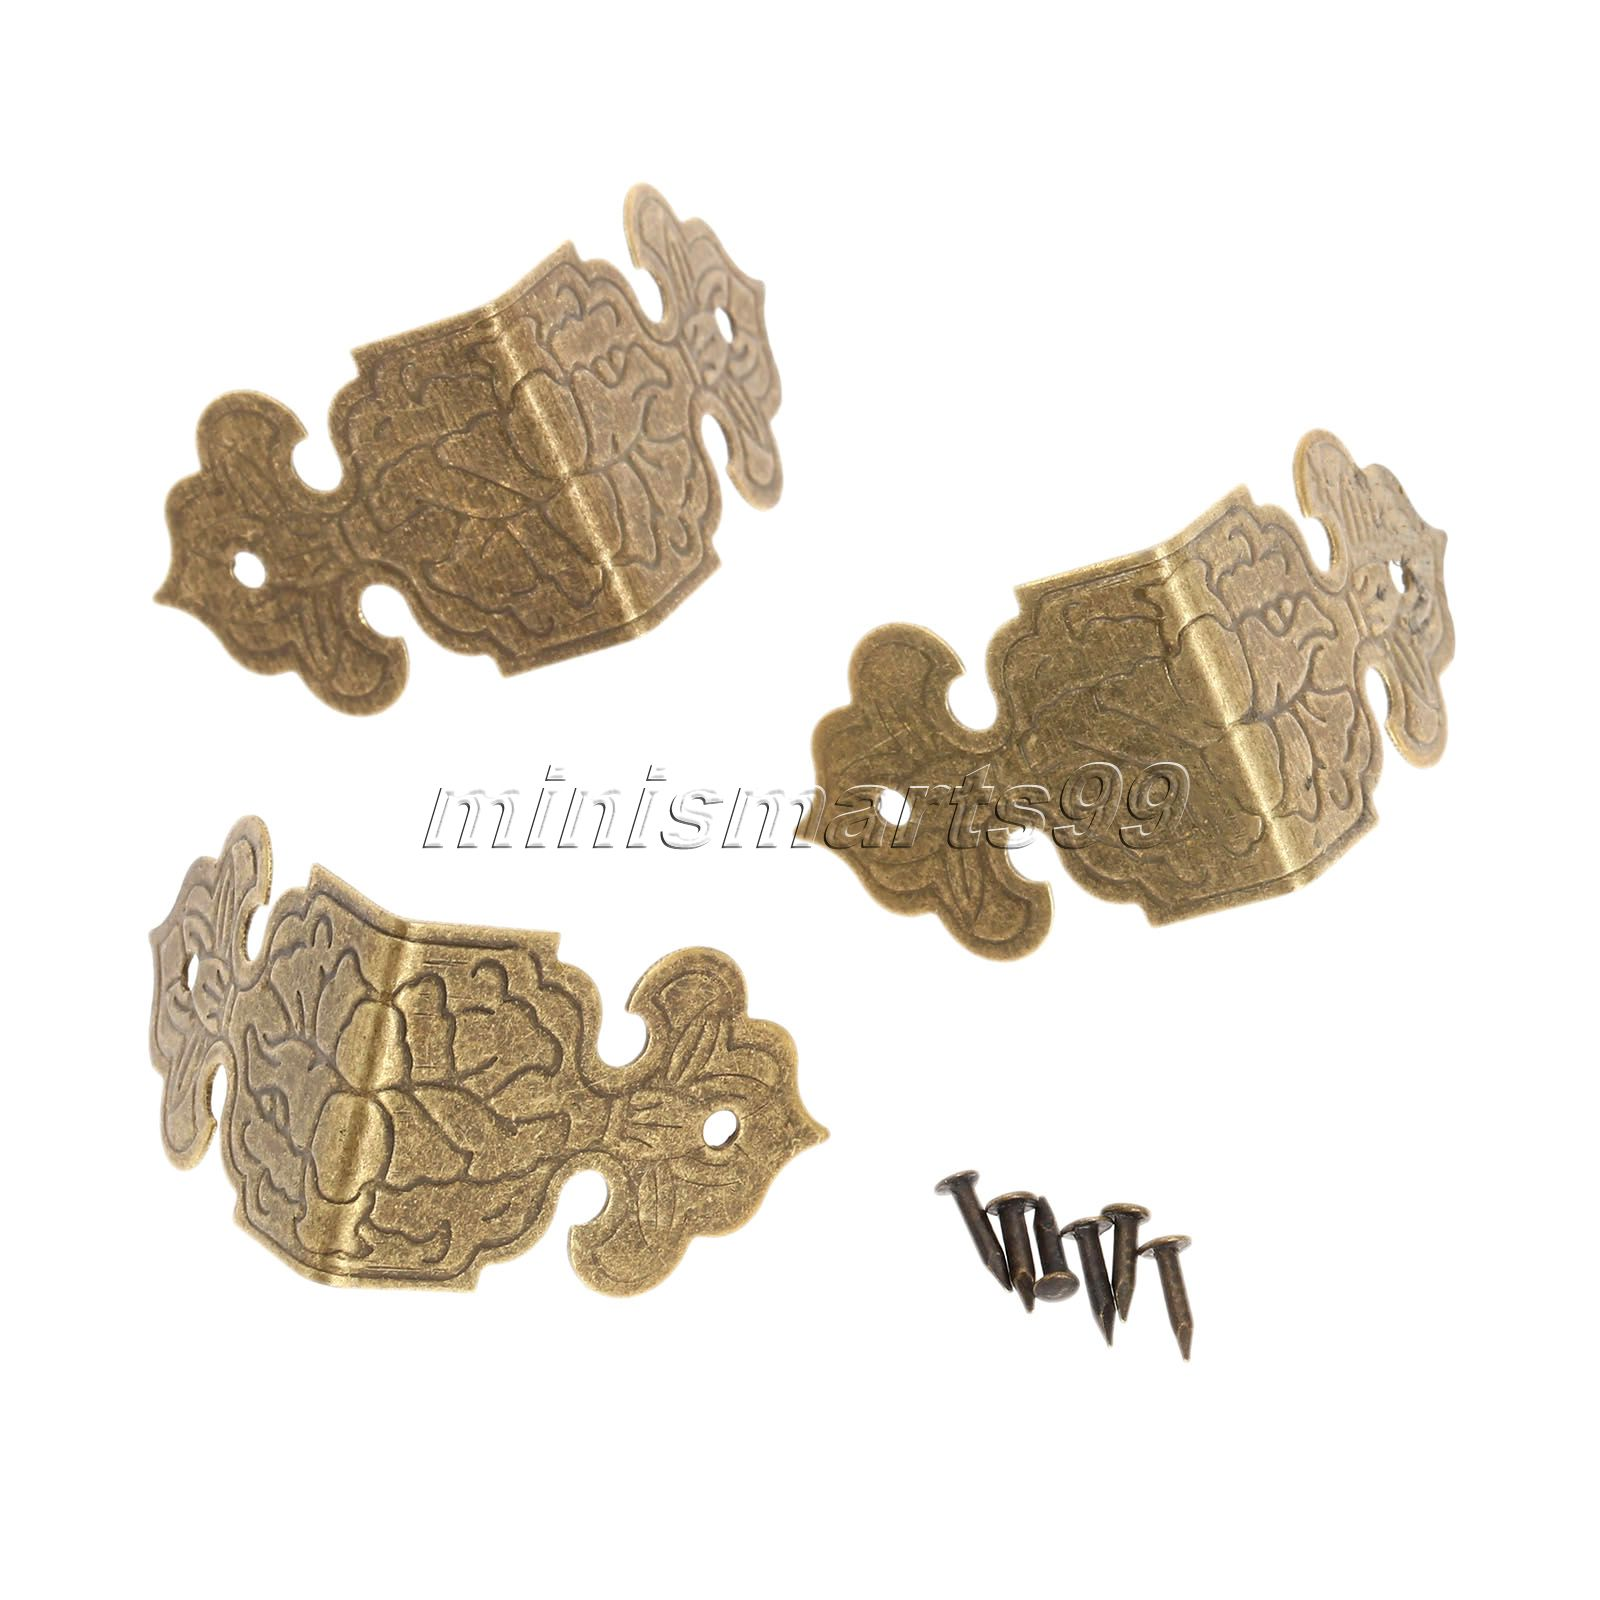 12x Bronze/Golden Decorative Corner Brackets Jewelry Chest Gift Wood Box Edge Mental Corner Protector Furniture Fittings 25x25mm<br><br>Aliexpress